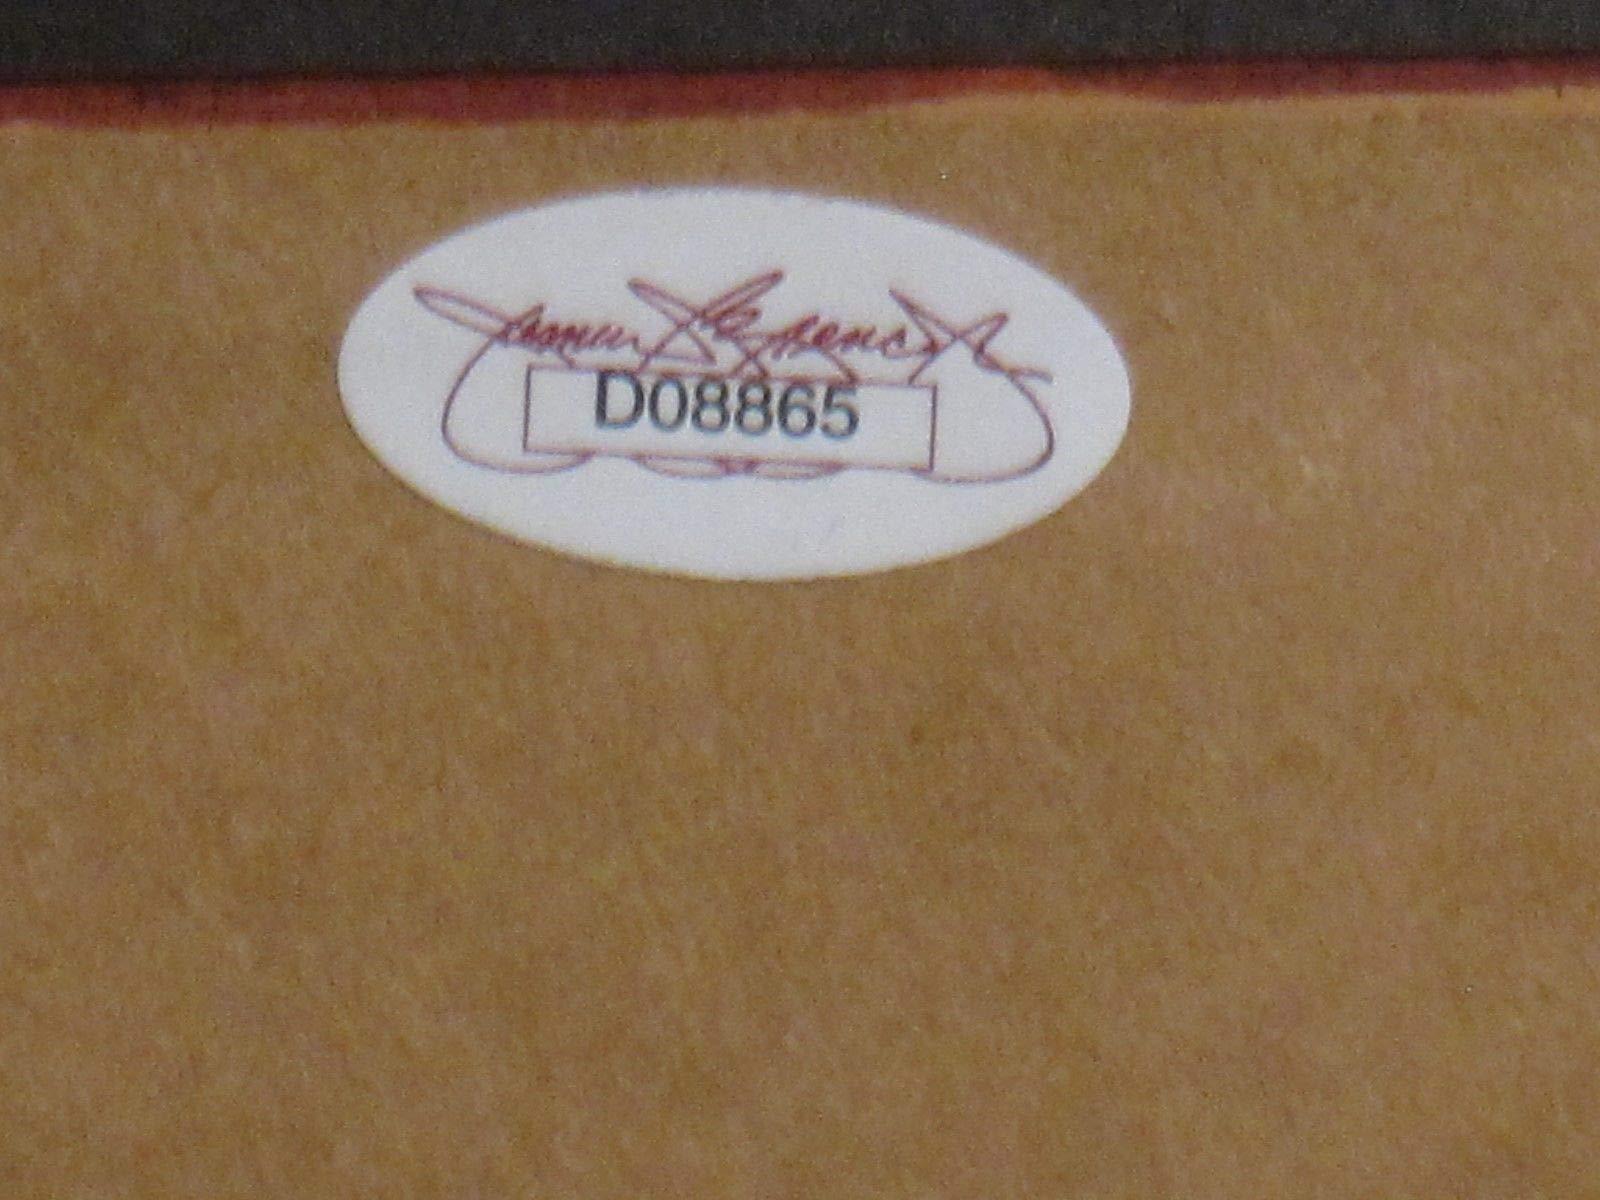 Hank Aaron Hof Autographed Signed Check Framed 8x10 Photo & Hr Game Tickets JSA